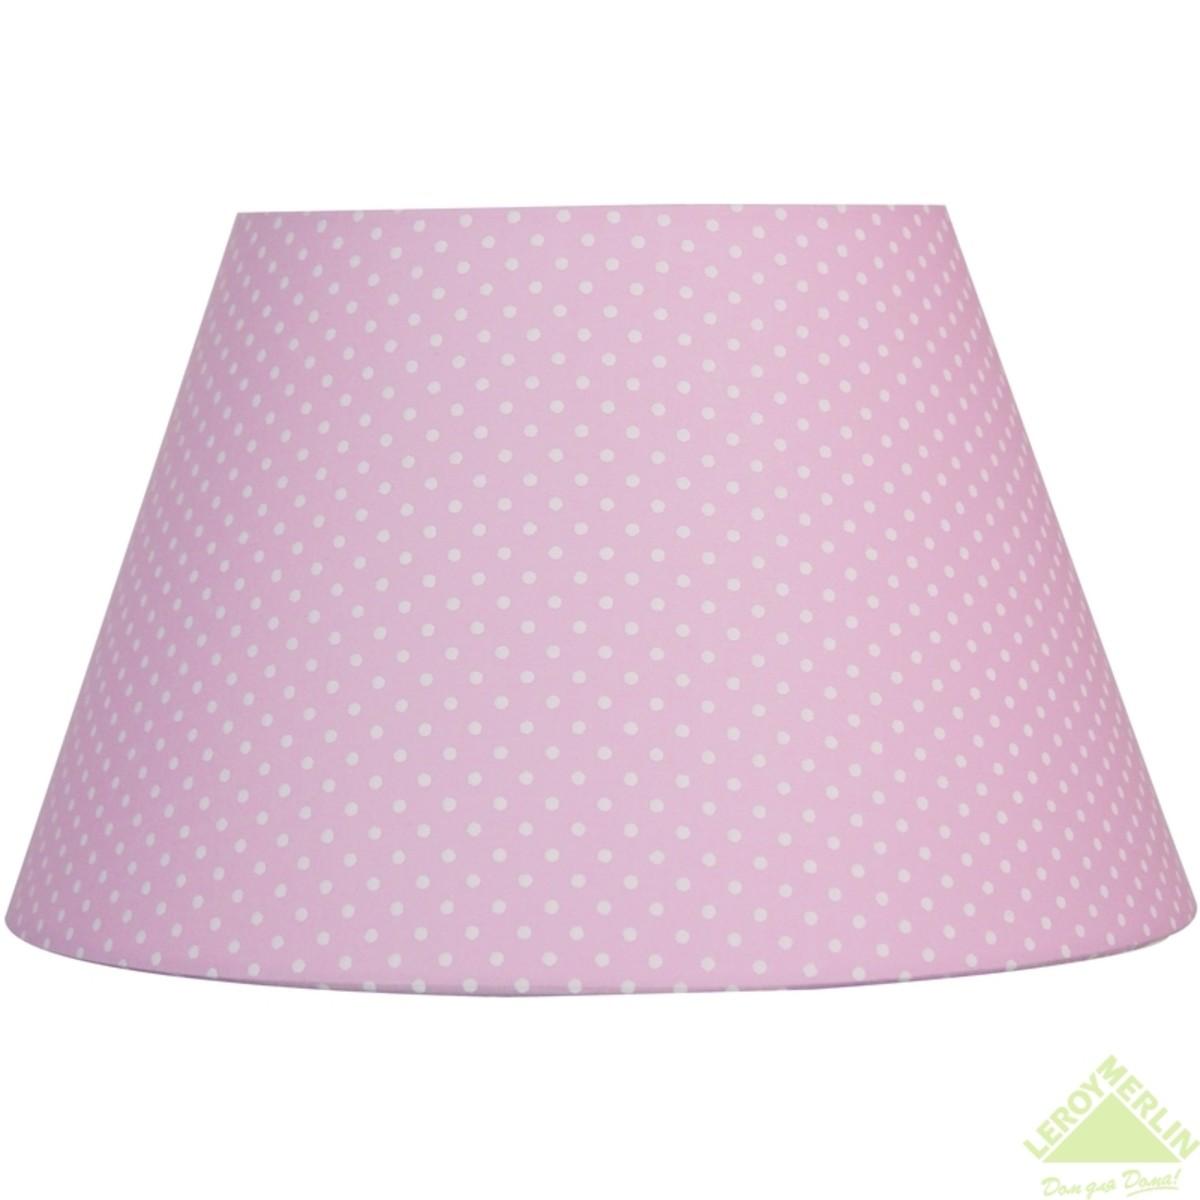 Абажур Pink with white dots средний 1xE14